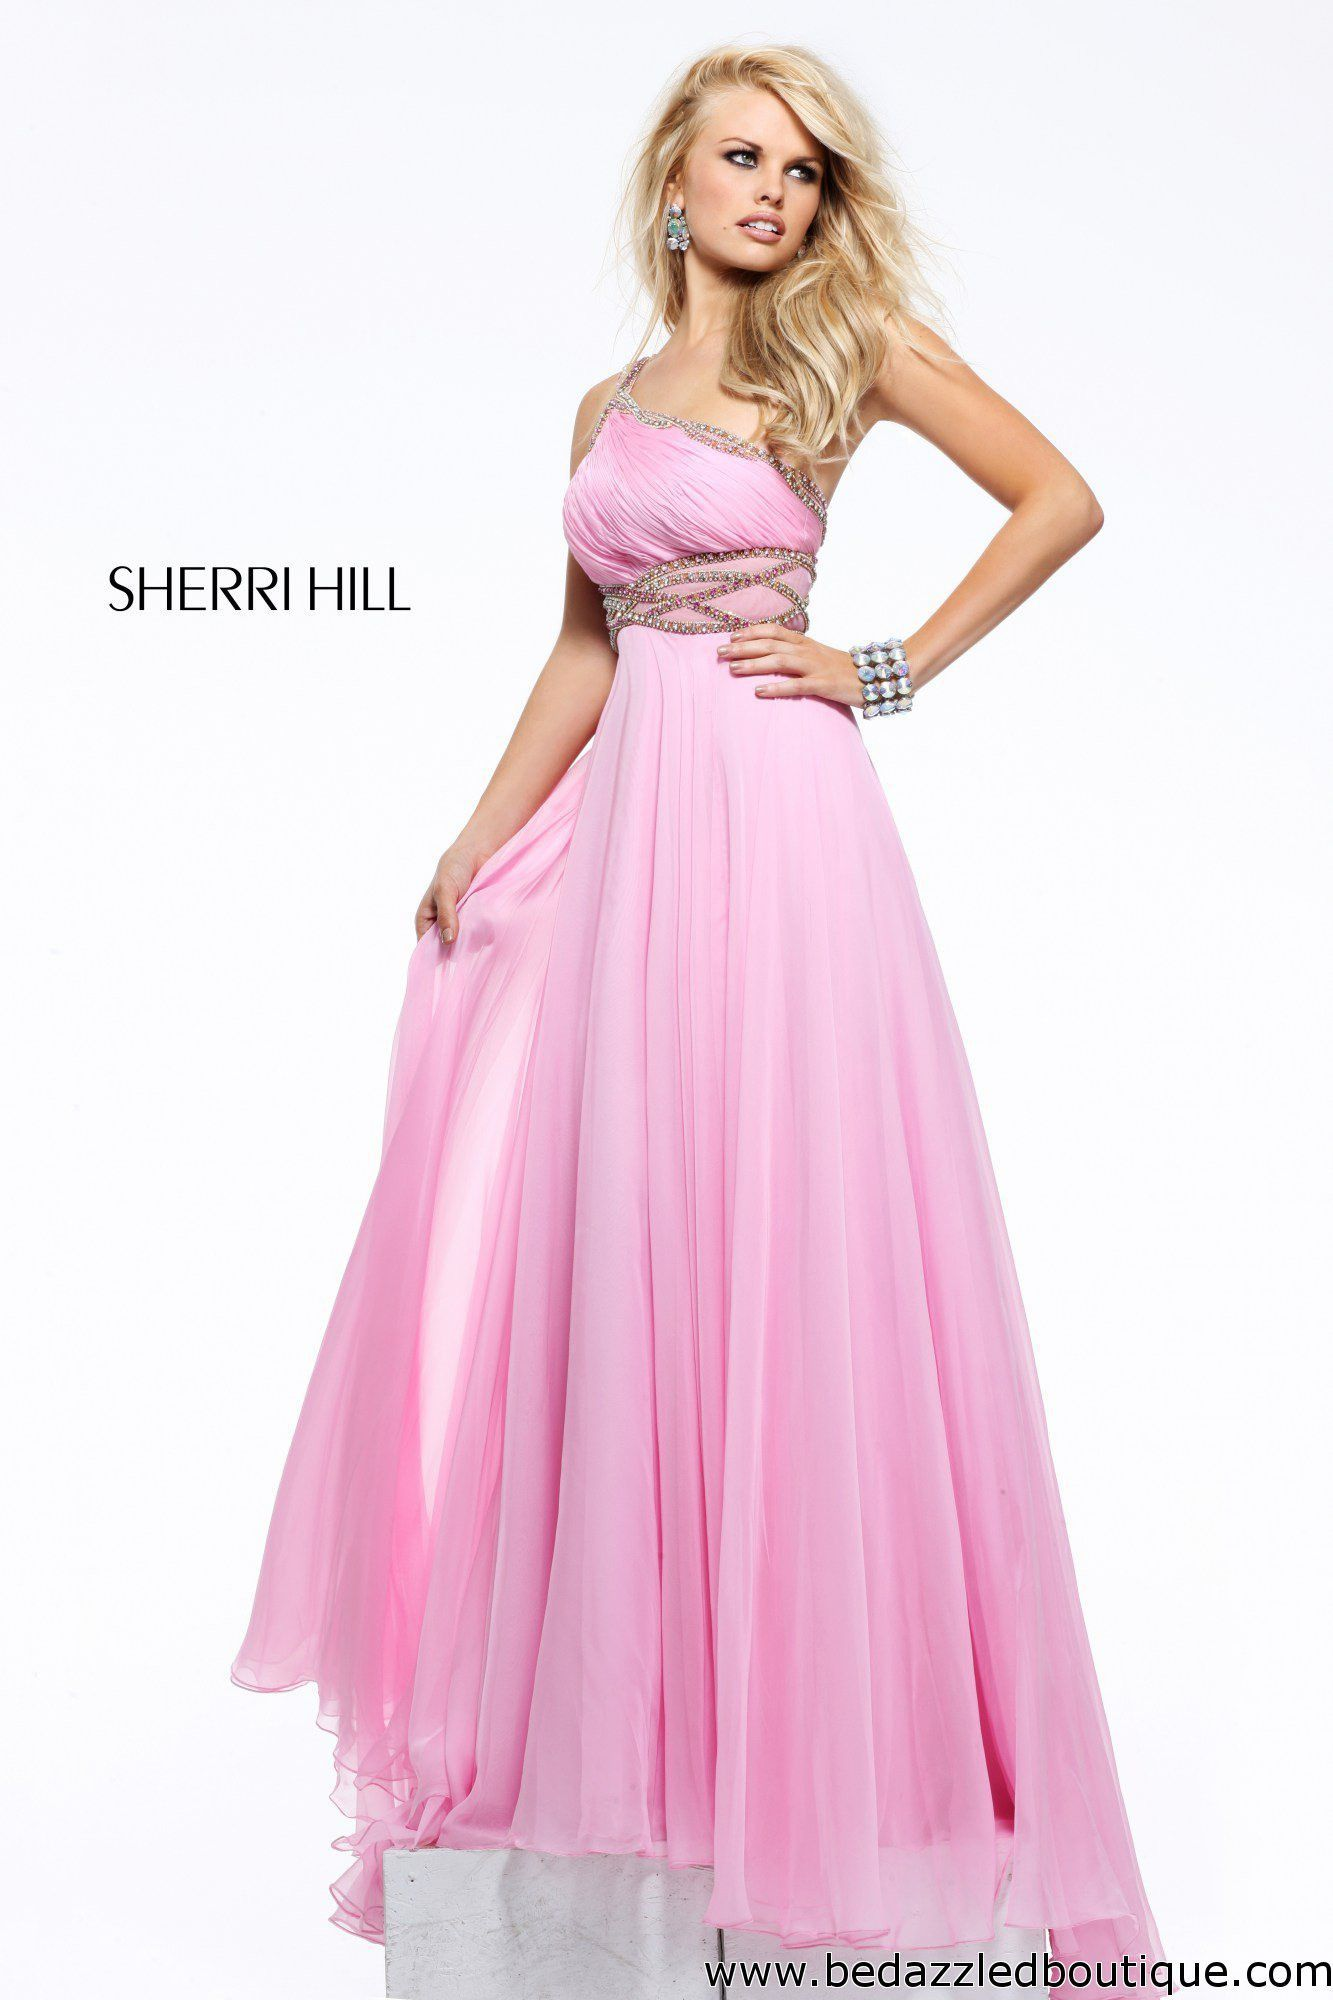 Sherri Hill 1537 | Puntadas | Pinterest | Puntadas